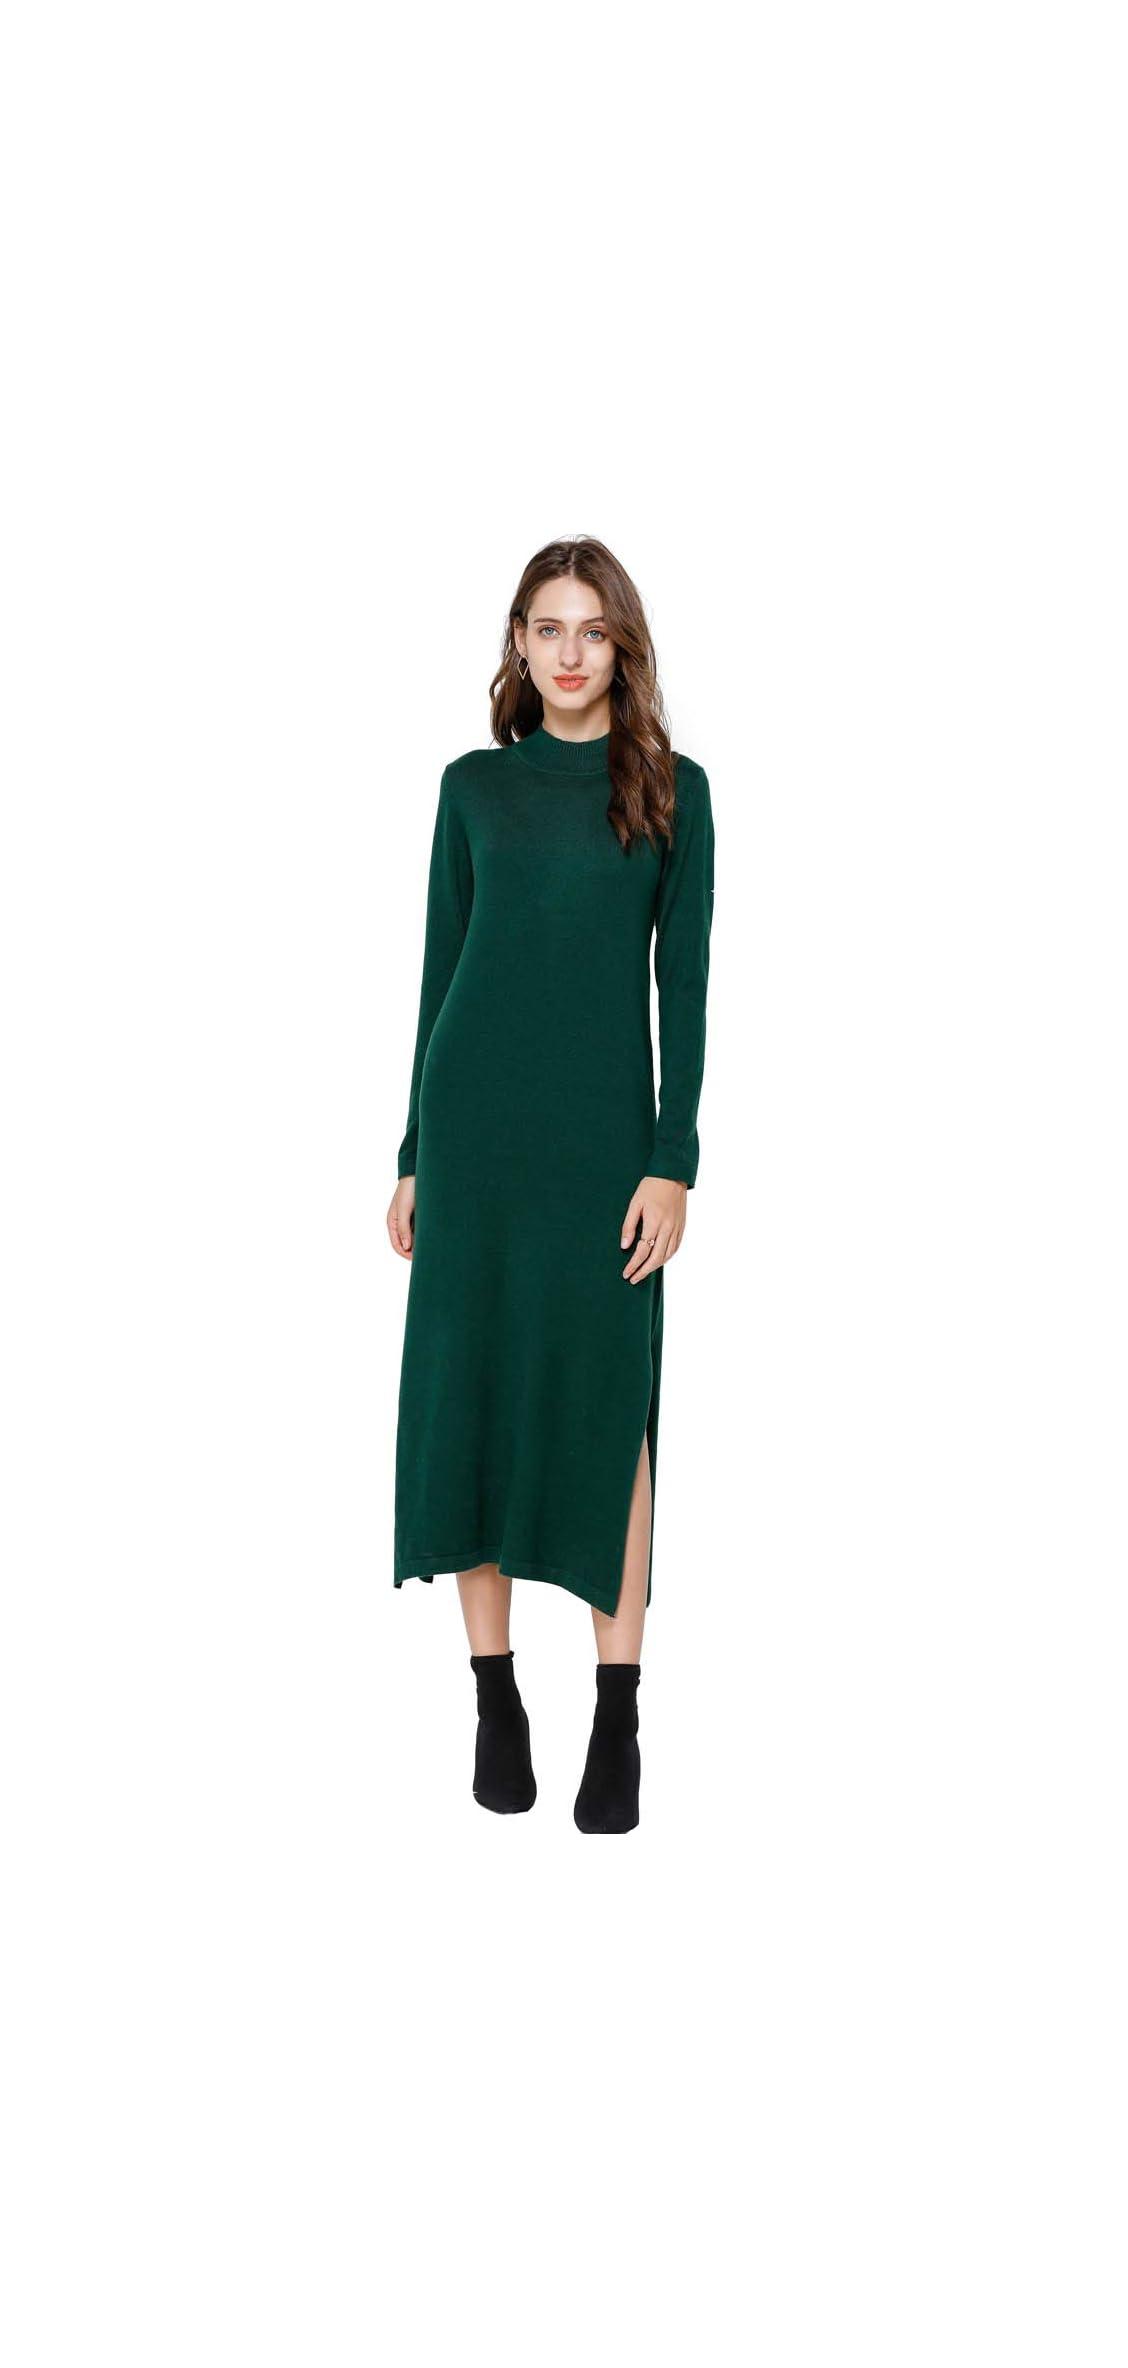 Cashmere Sweater Dress For Women Crewneck Calf Length